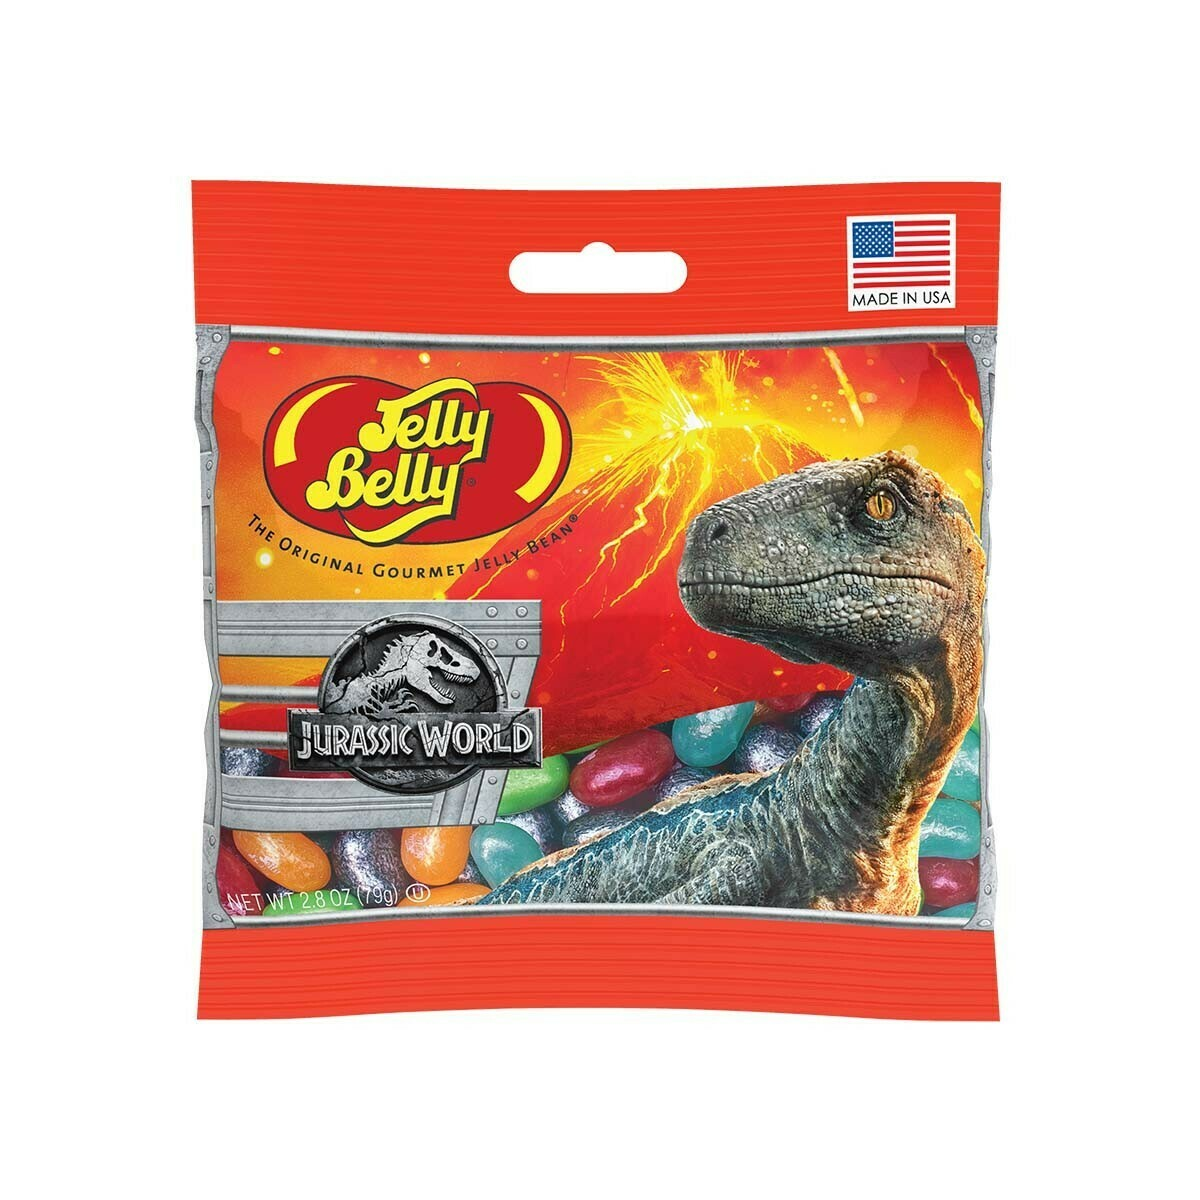 Jurassic World Jelly Belly